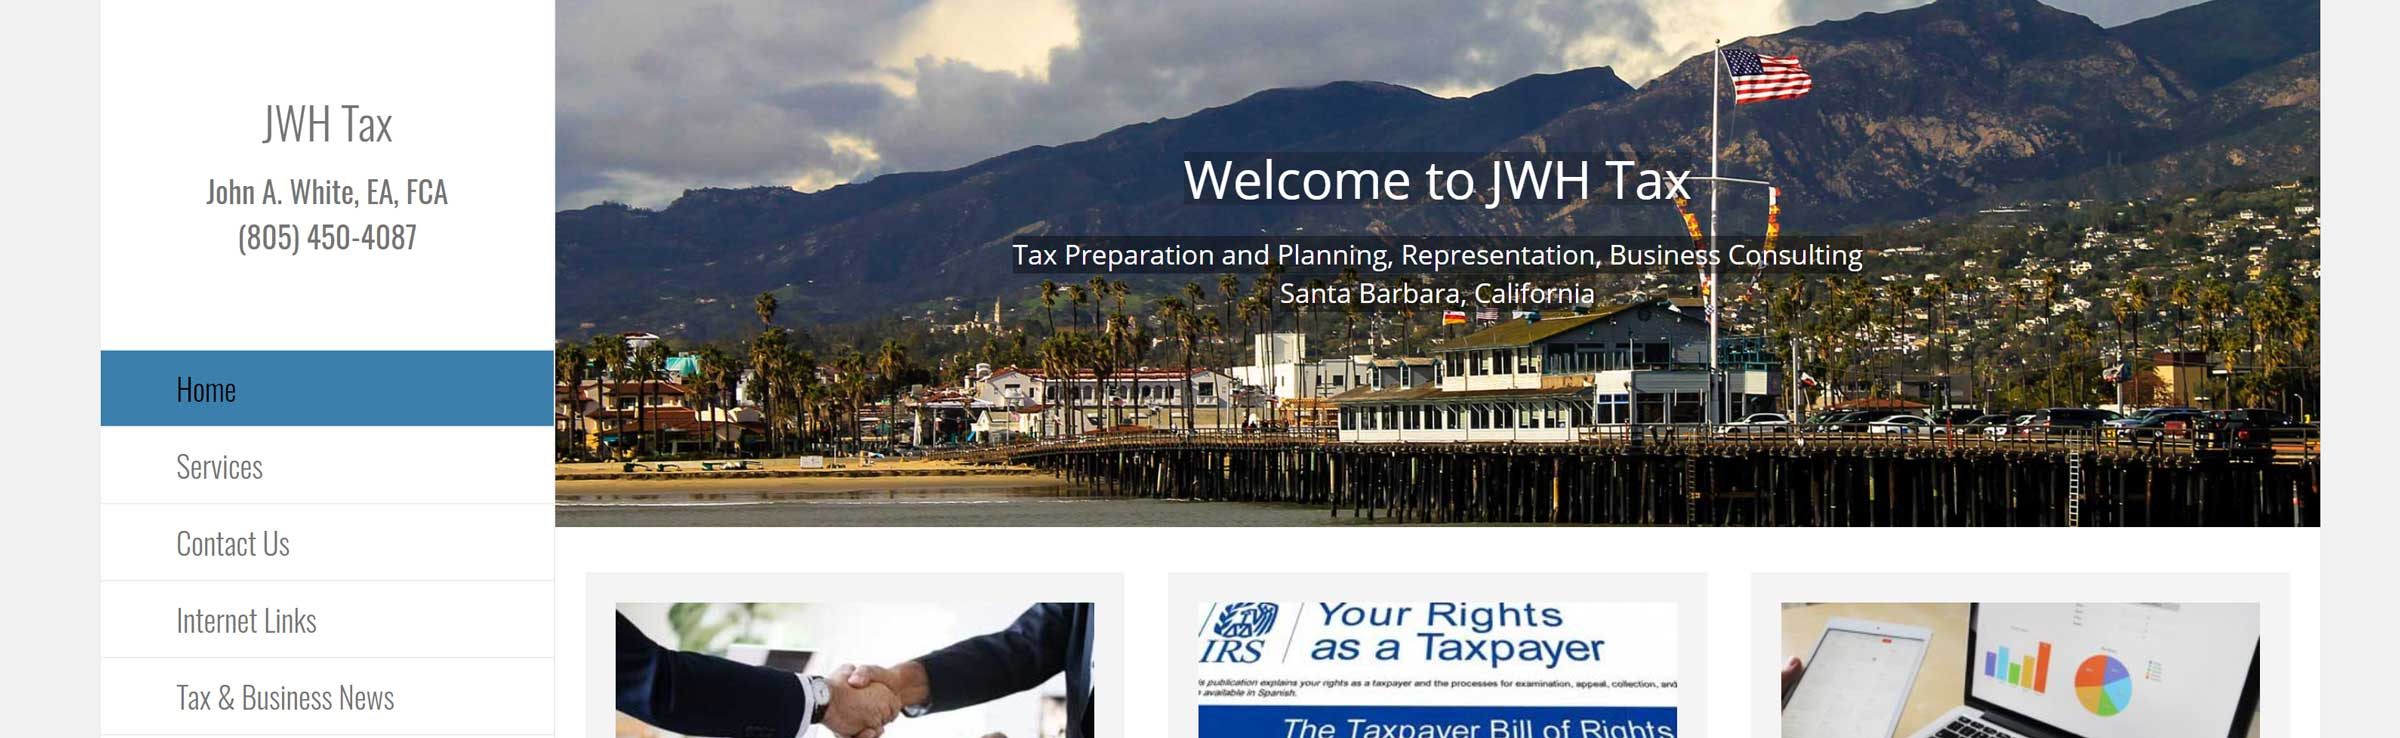 JWH Tax banner